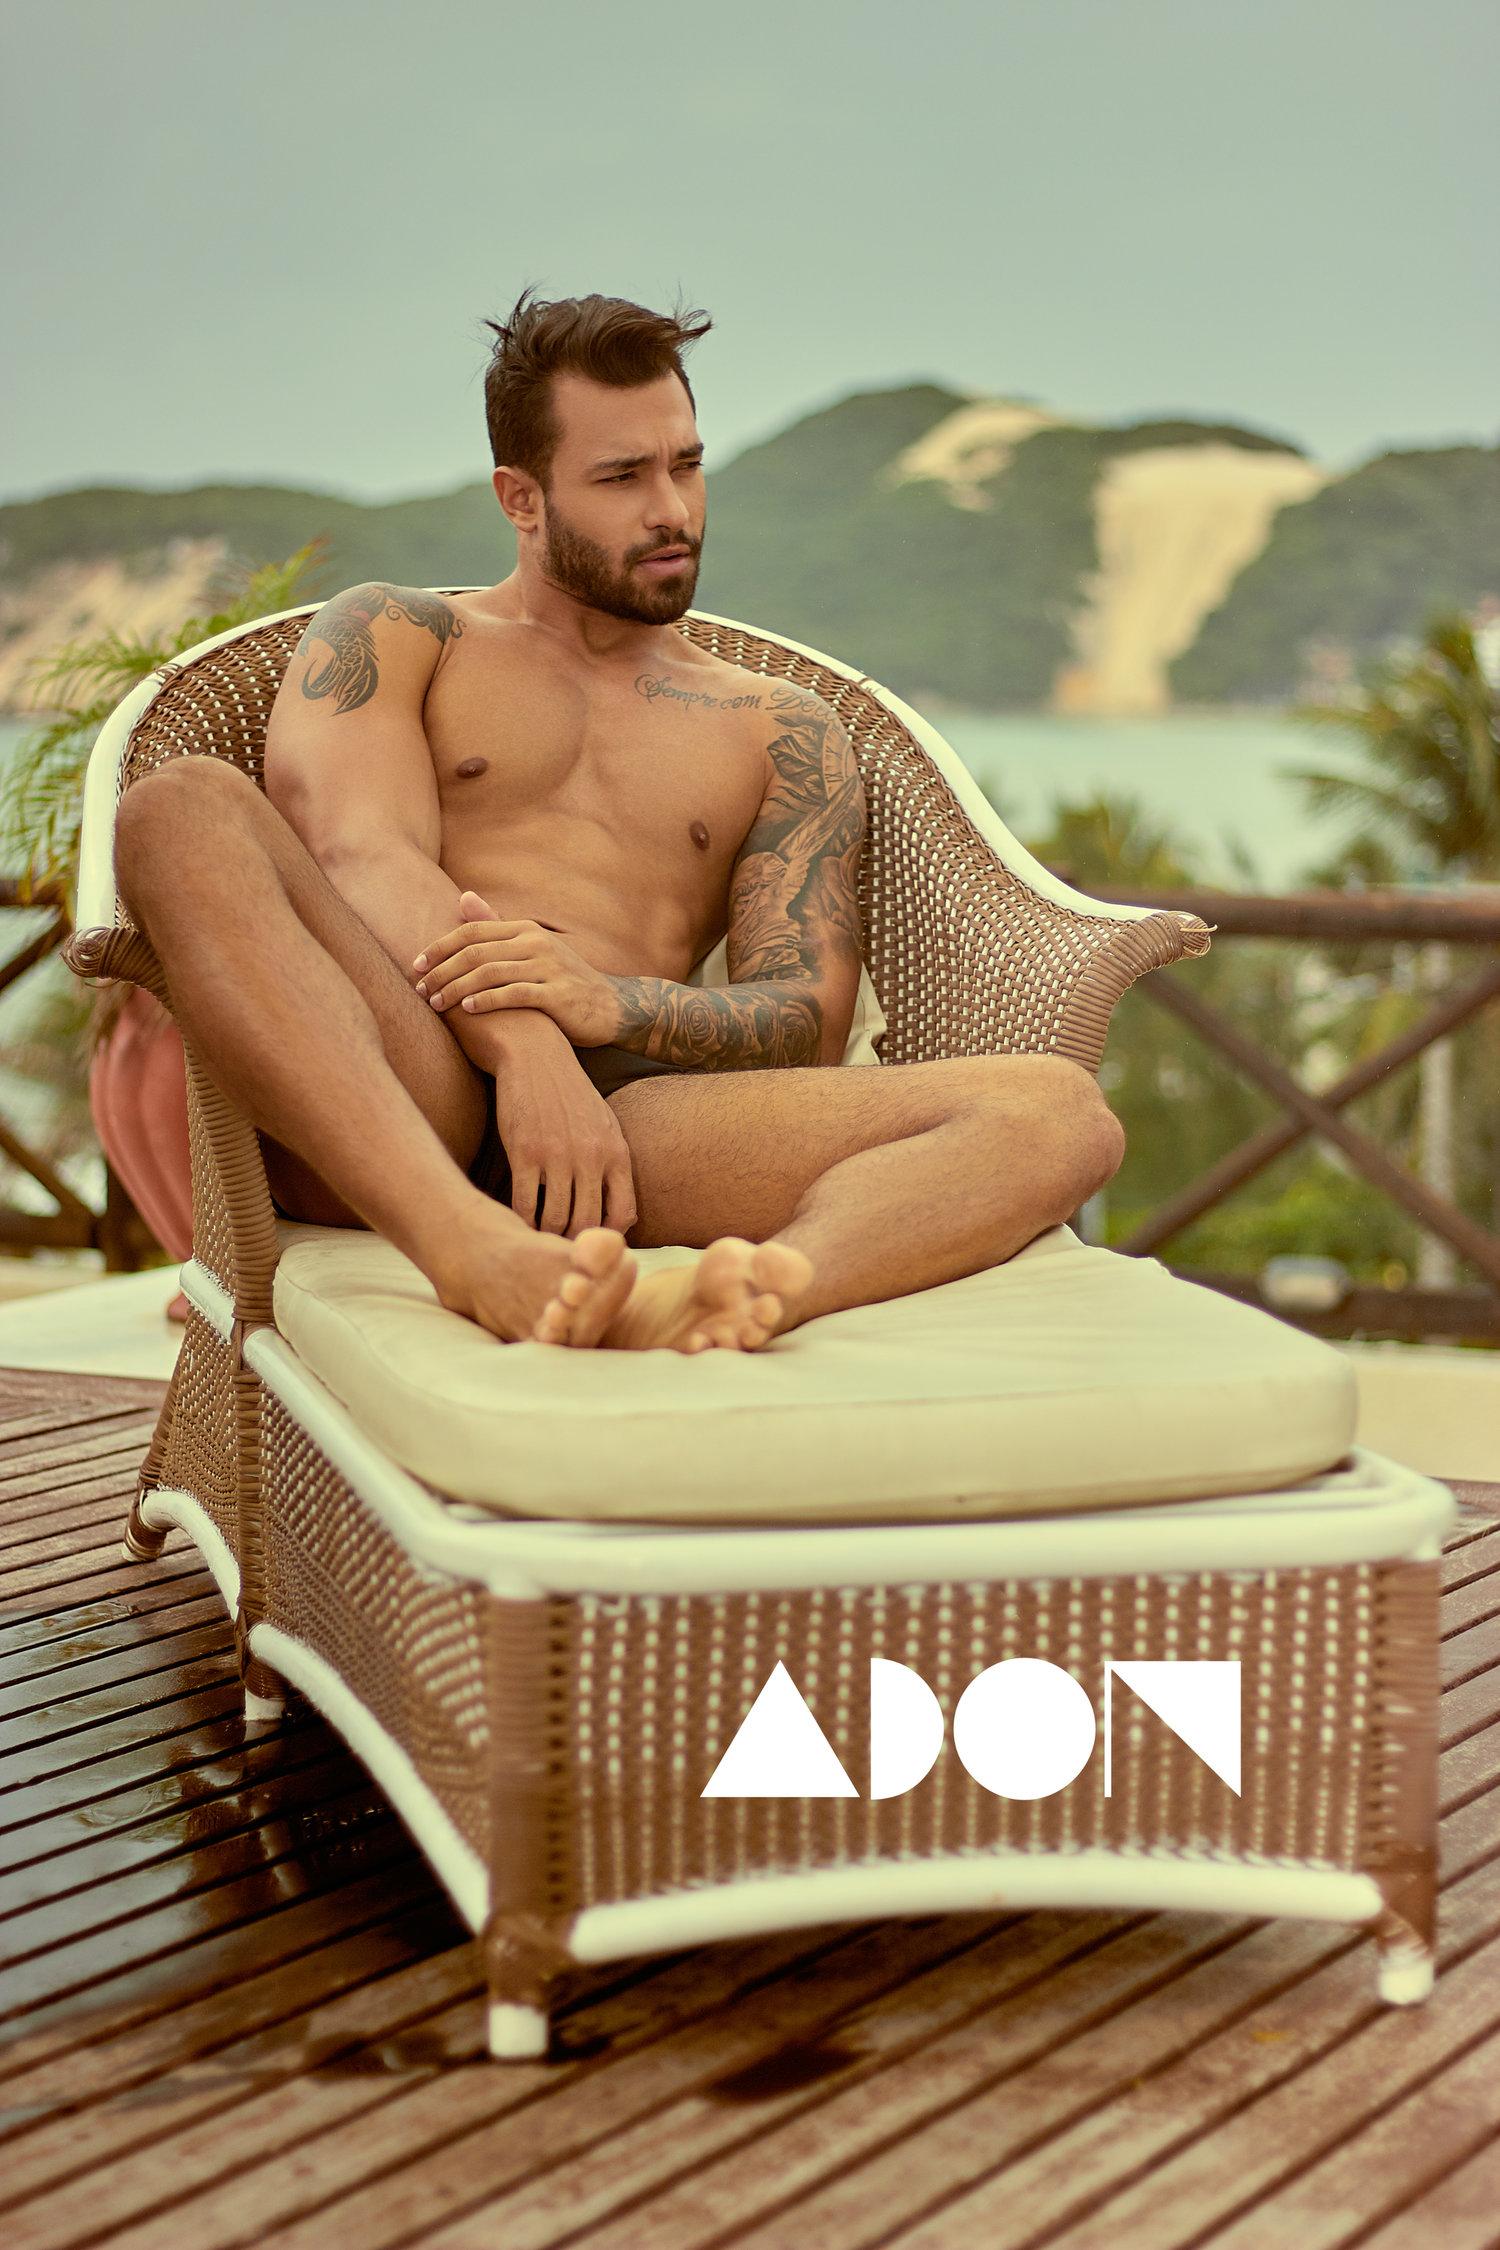 Adon Exclusive: Model Bruno Mooneyhan By Pedro Fonseca